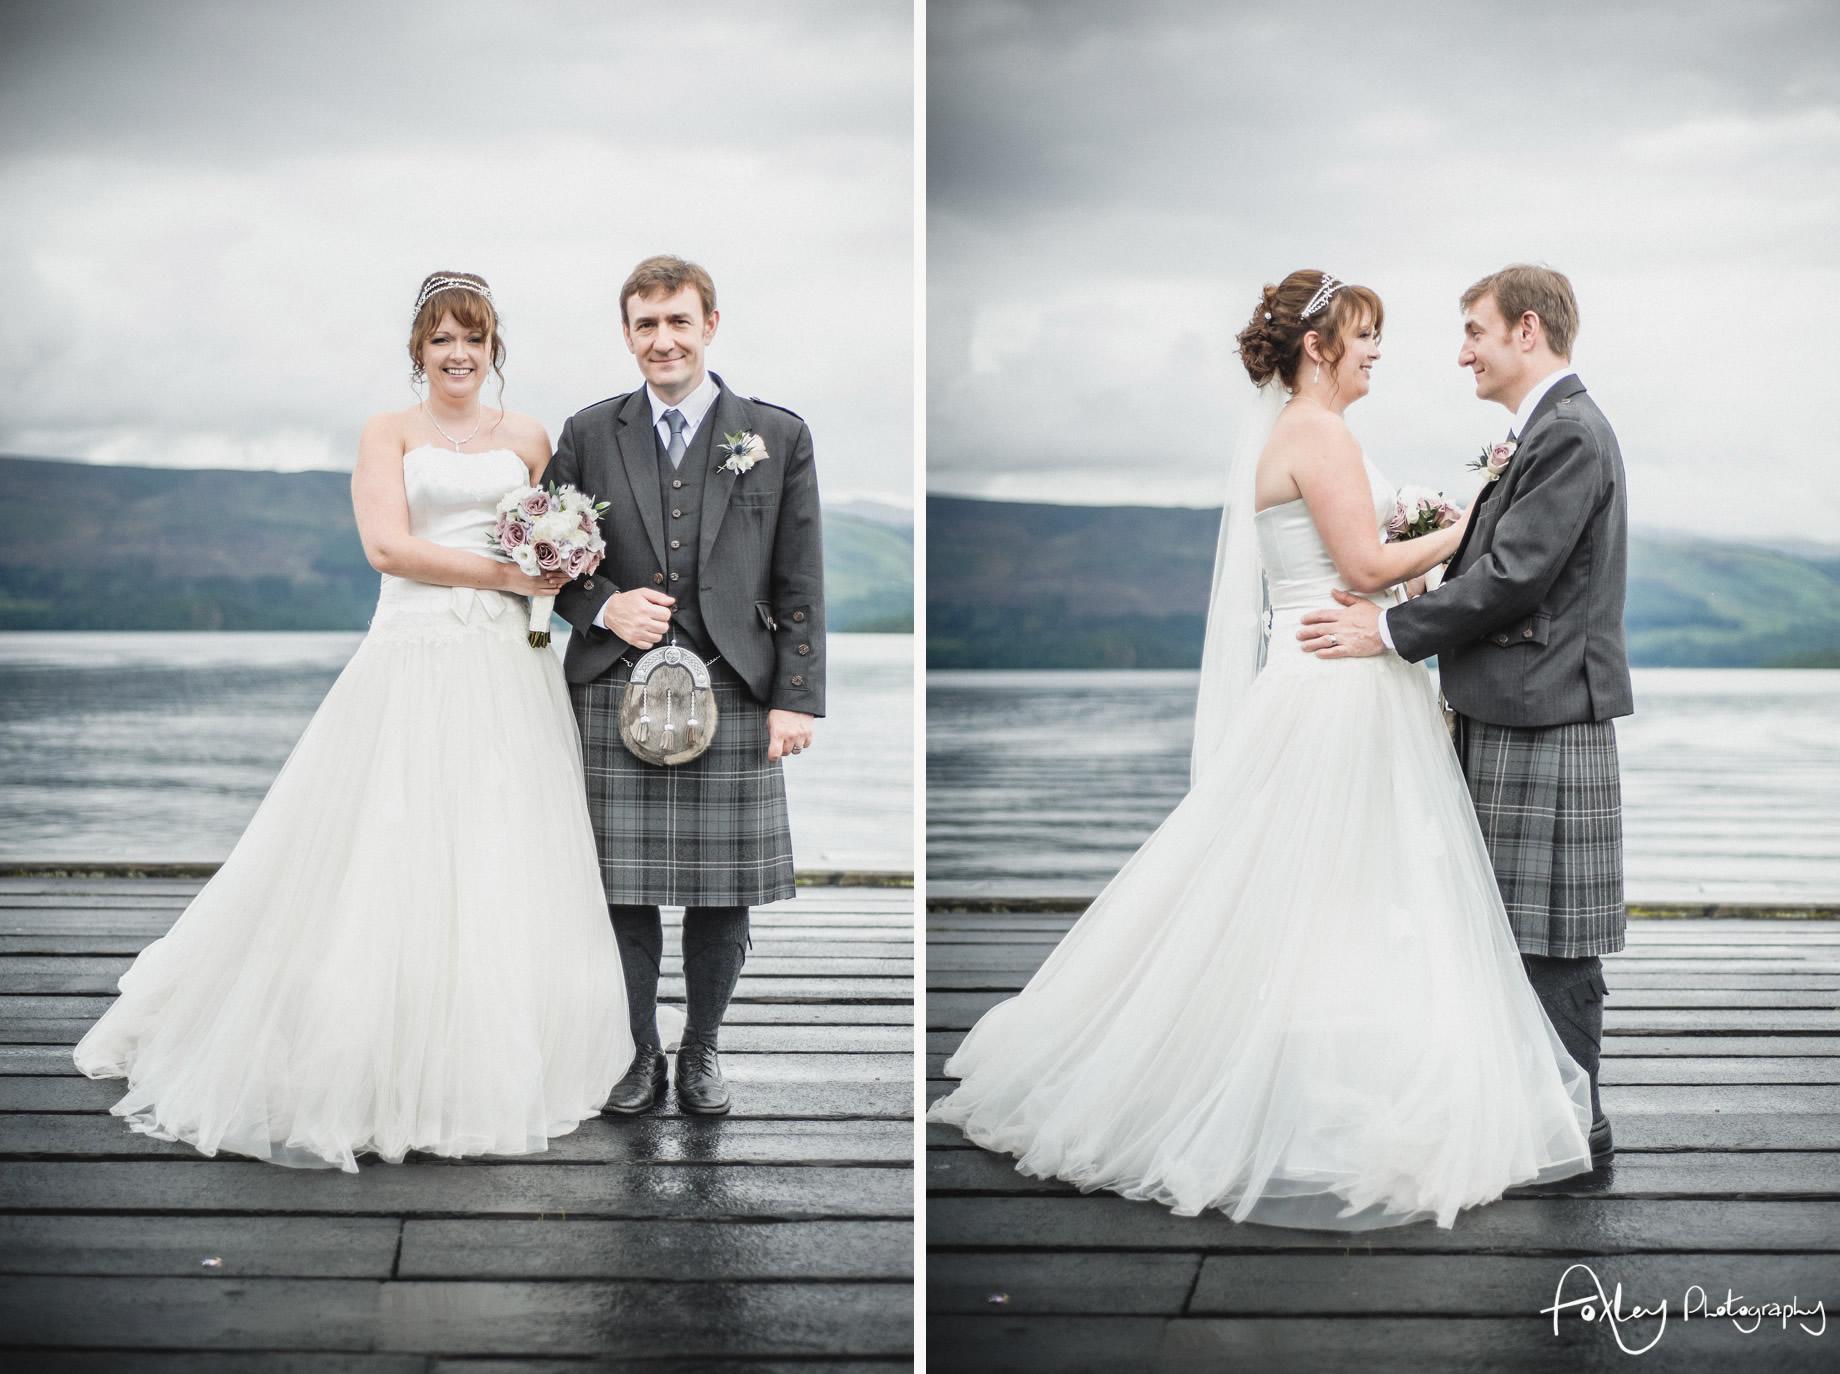 Alys-And-Davids-Wedding-Loch-Lomond-110